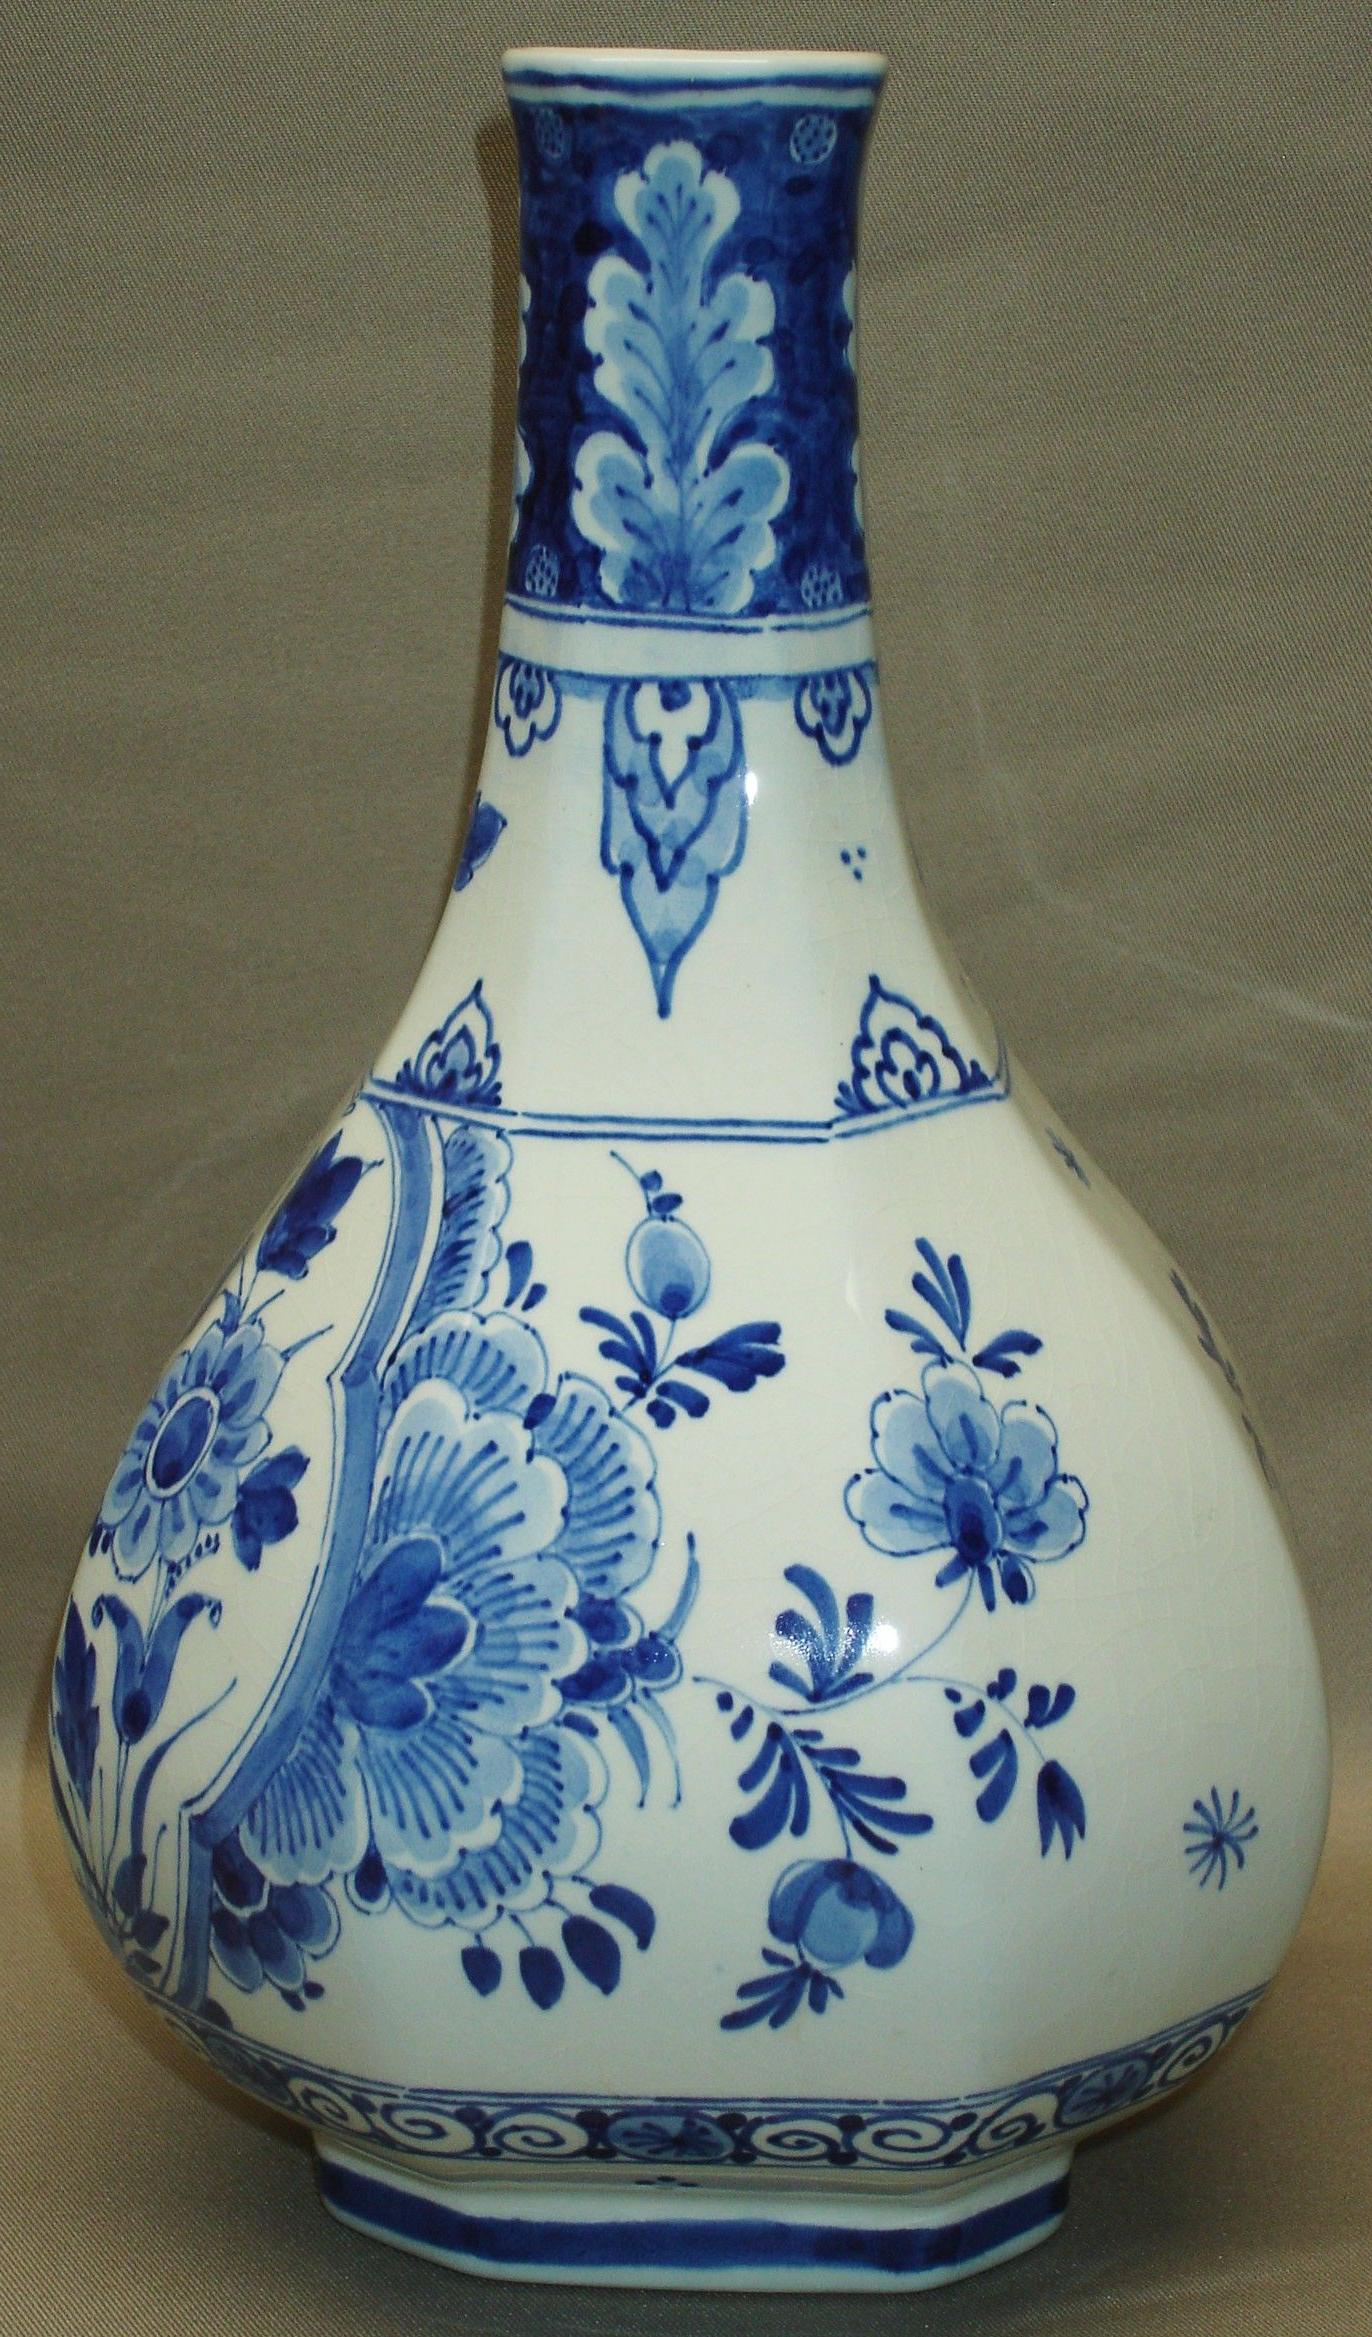 Types Of Ceramics, Blue With Regard To 2019 Swanson Ceramic Garden Stools (View 22 of 30)